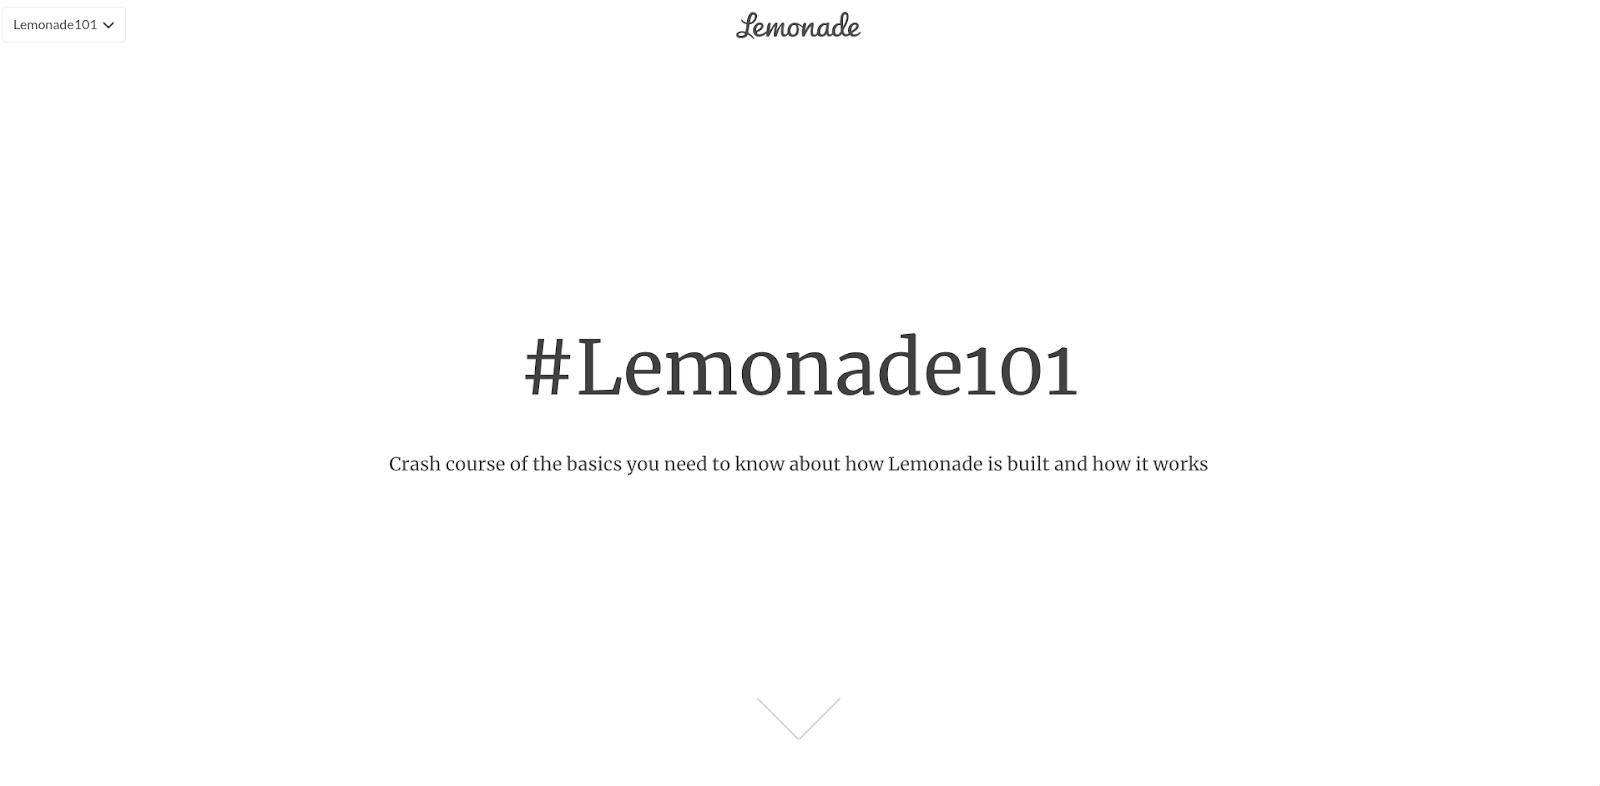 Lemonade 101